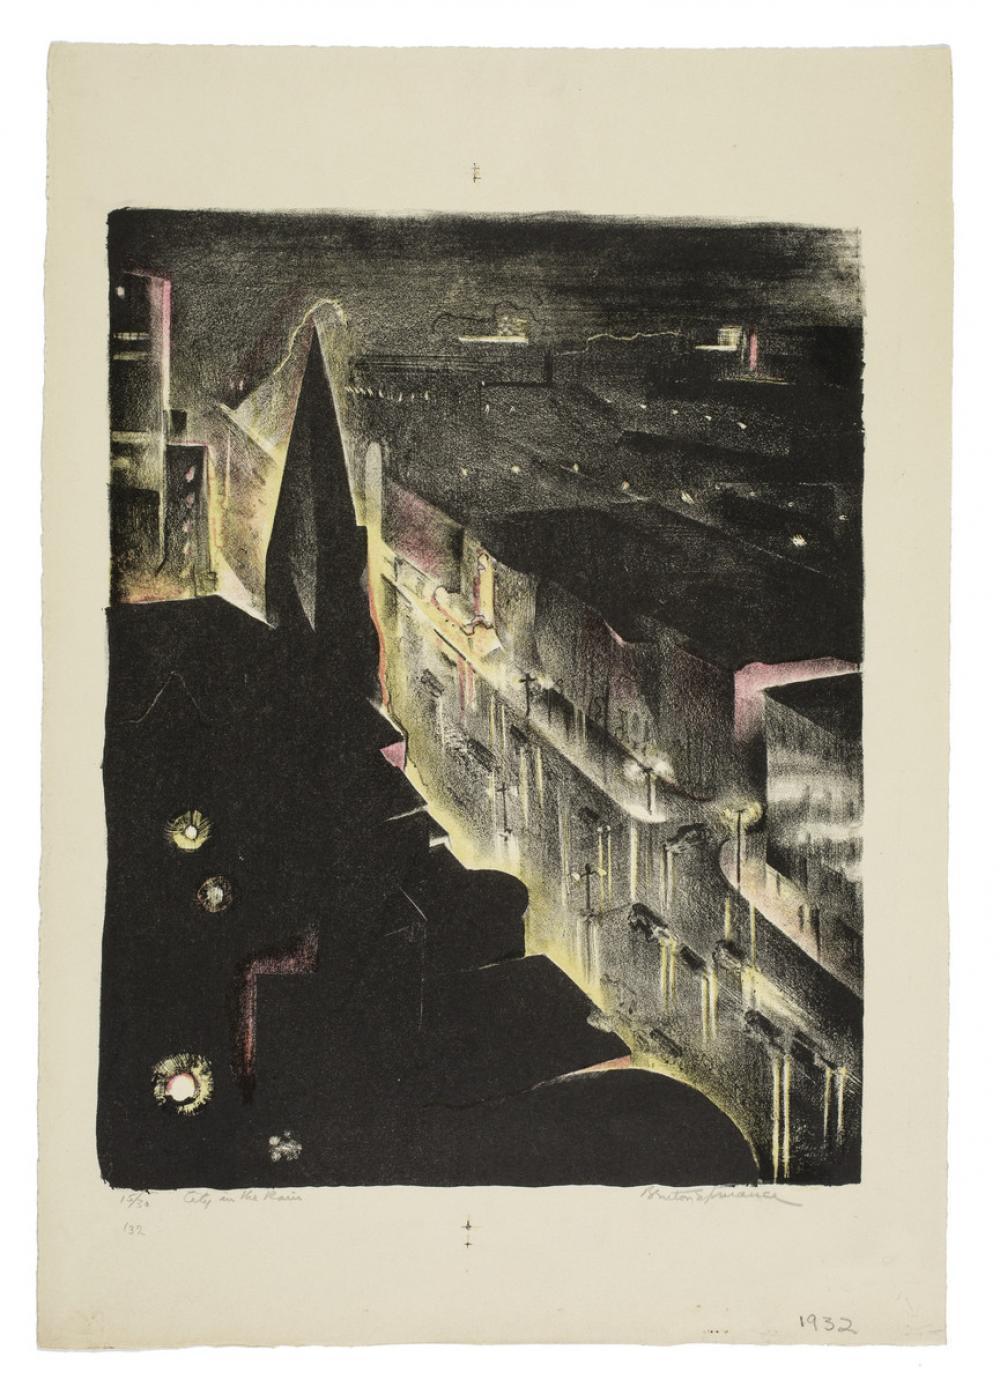 Benton Spruance (American, 1904-1967), City in the Rain, 1932